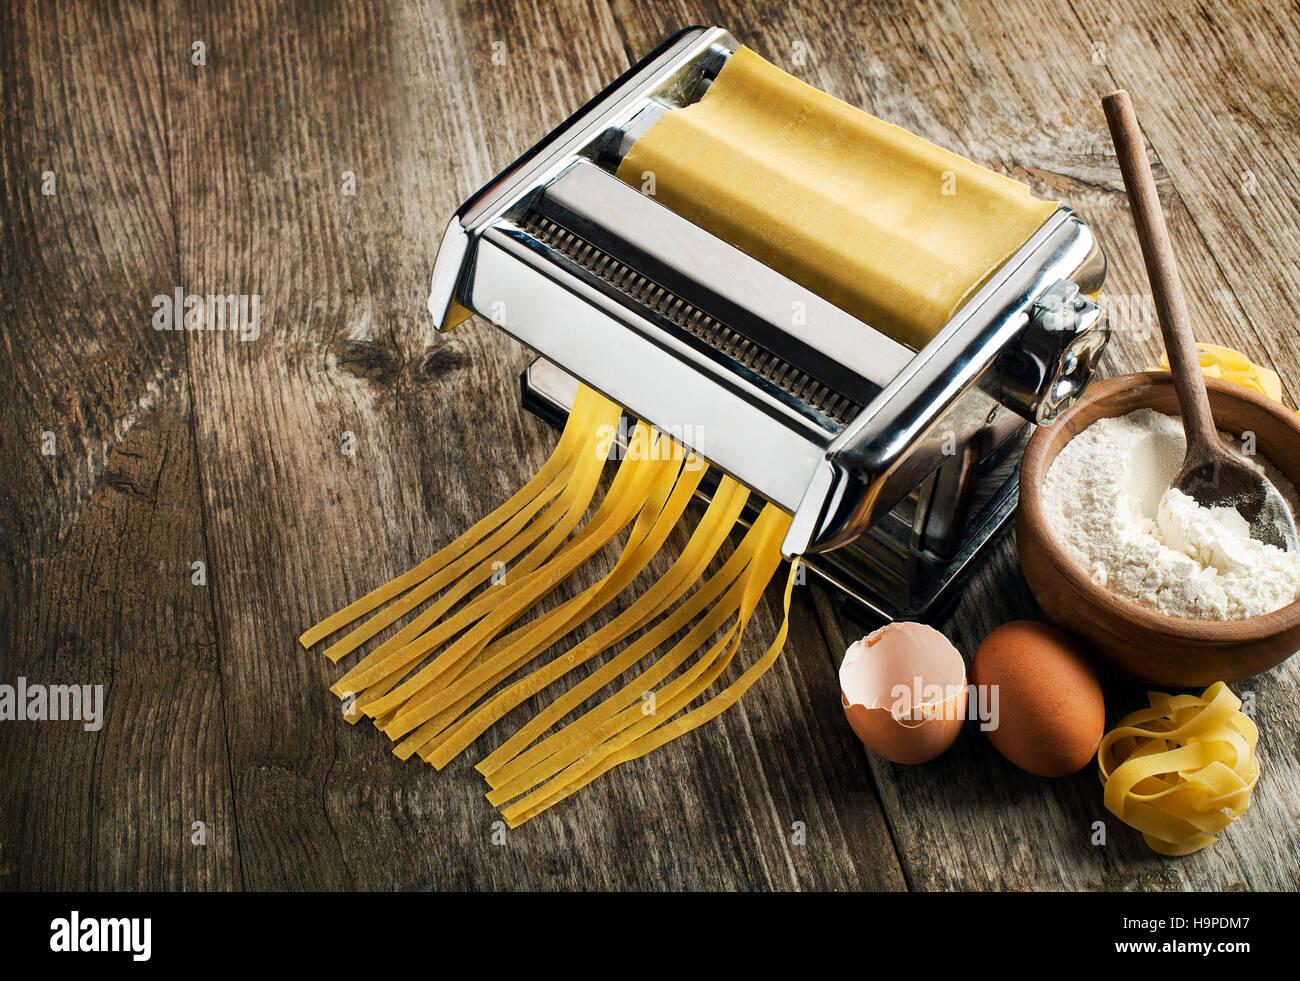 Fresh pasta making in machine on wooden background - Stock Image